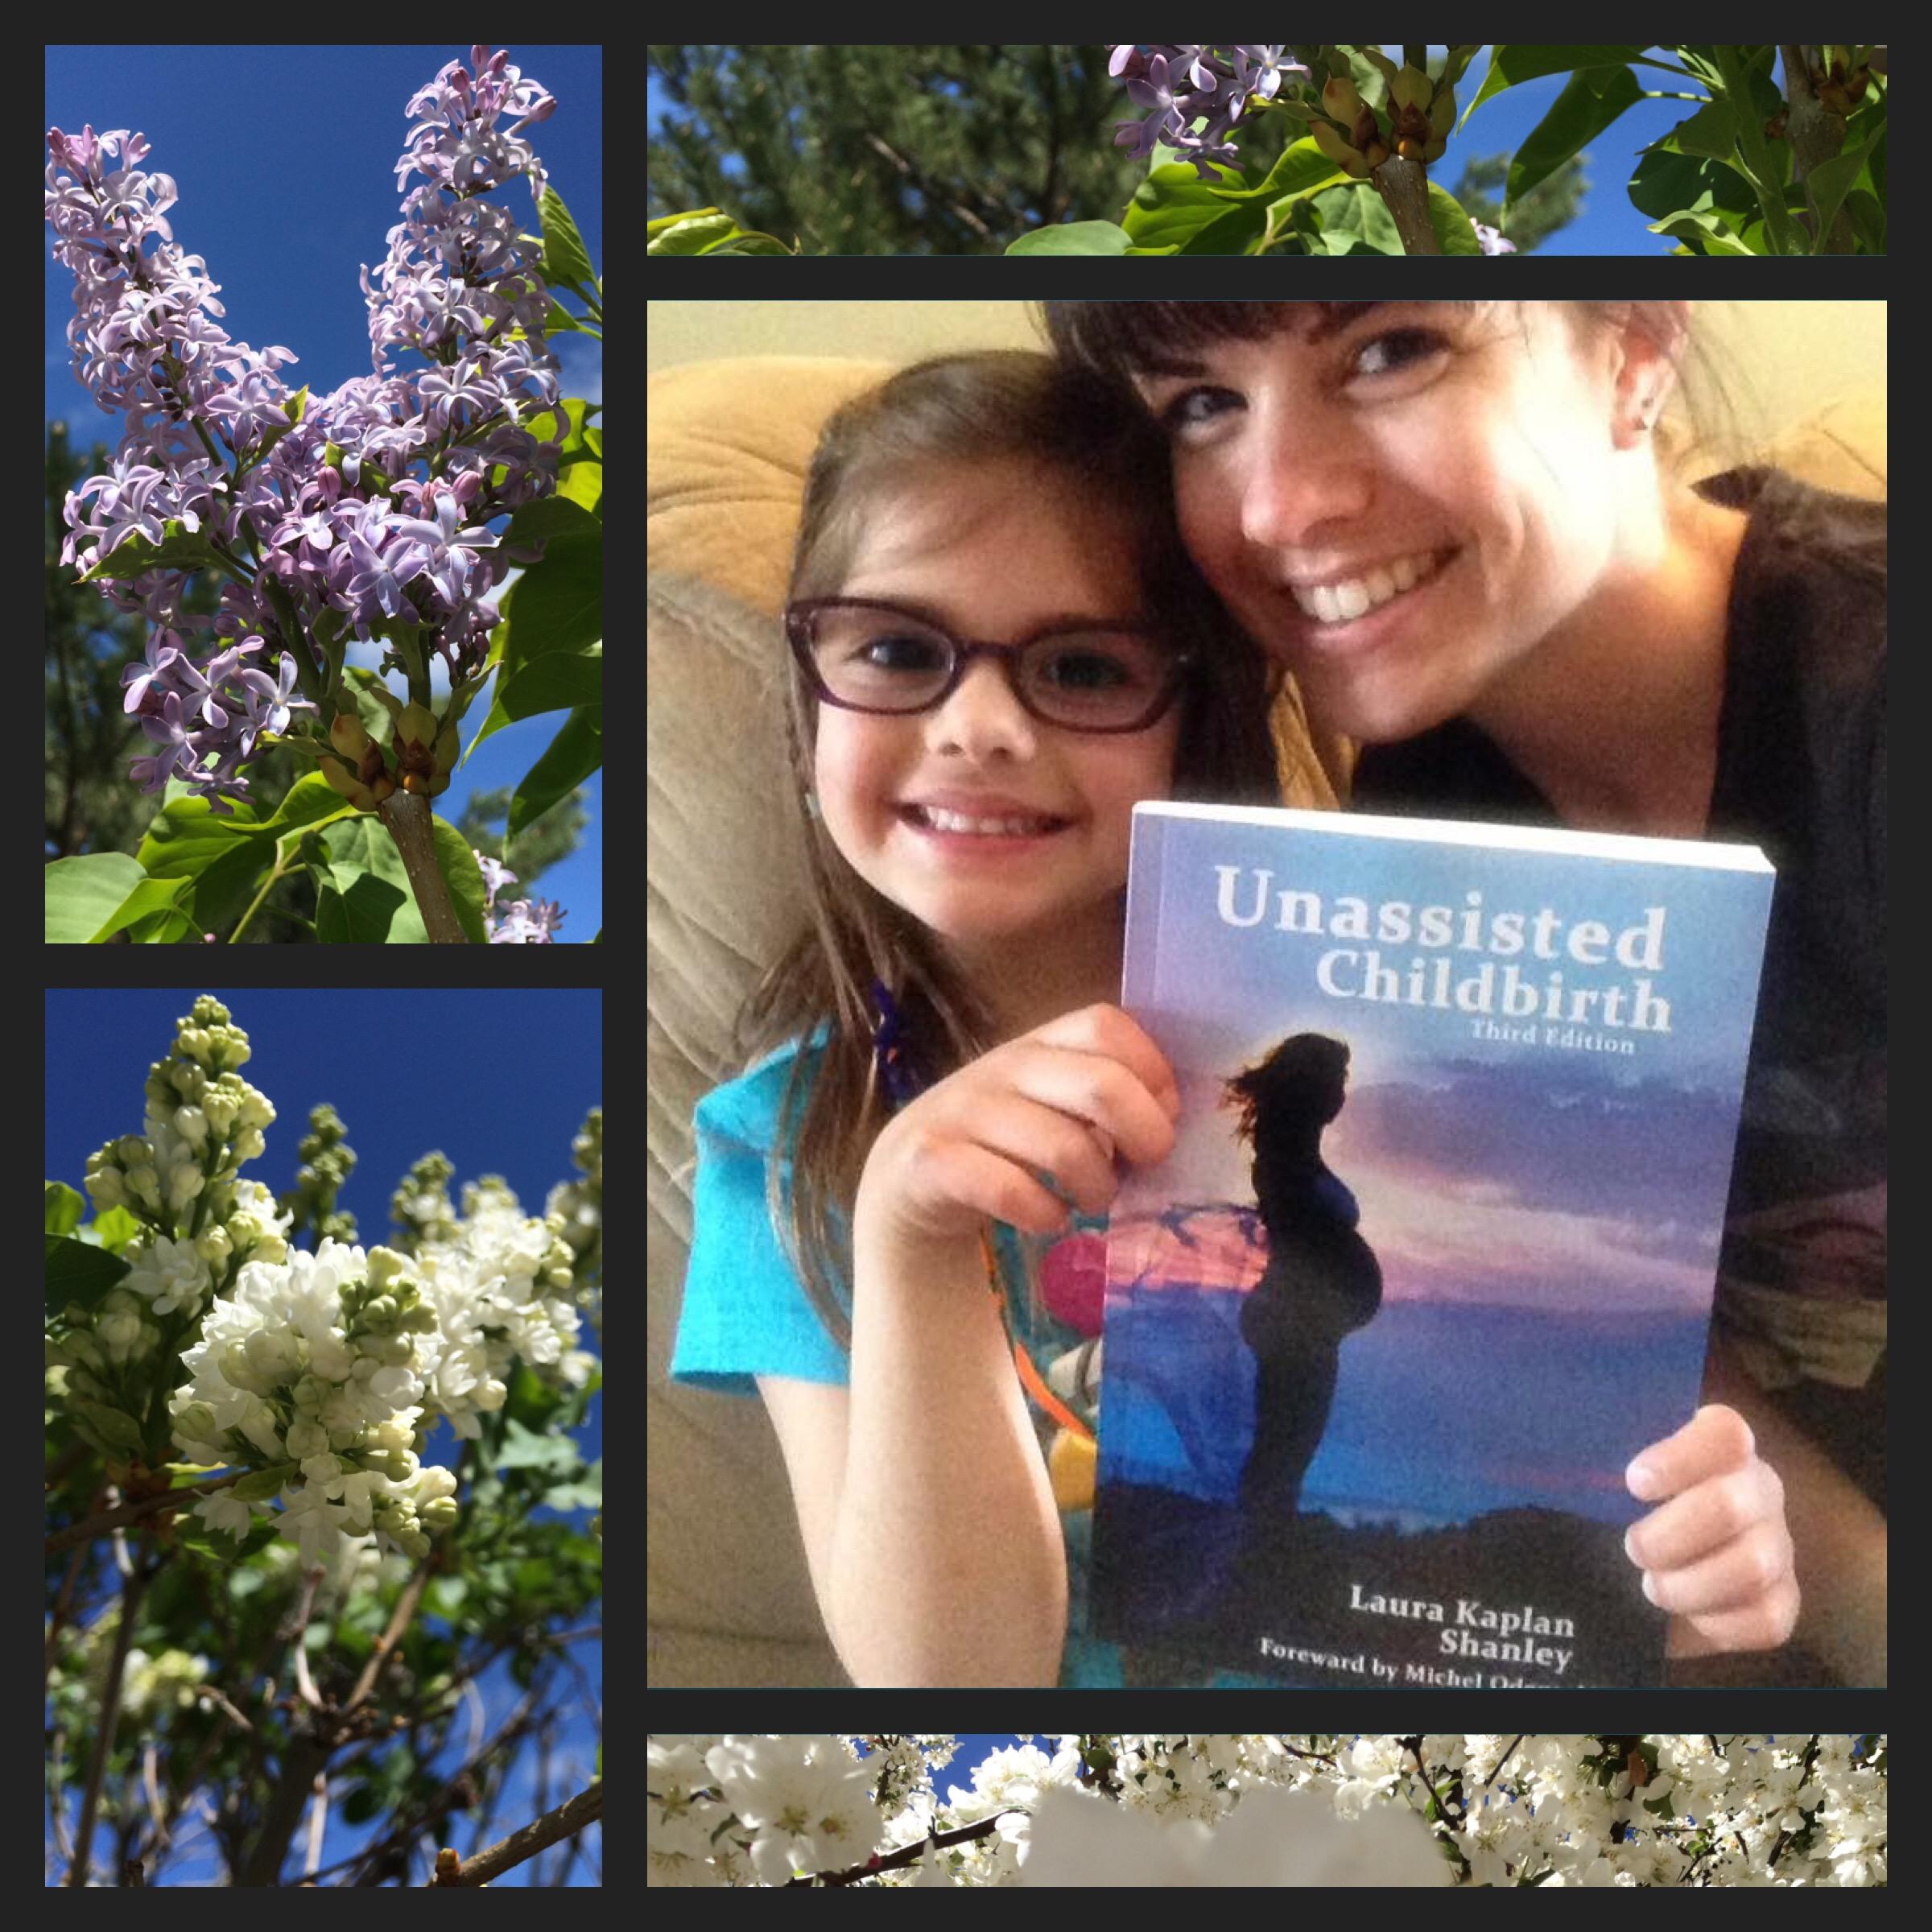 Laura Shanley on The Jenny Hatch Radio Show #UnassistedChildbirth